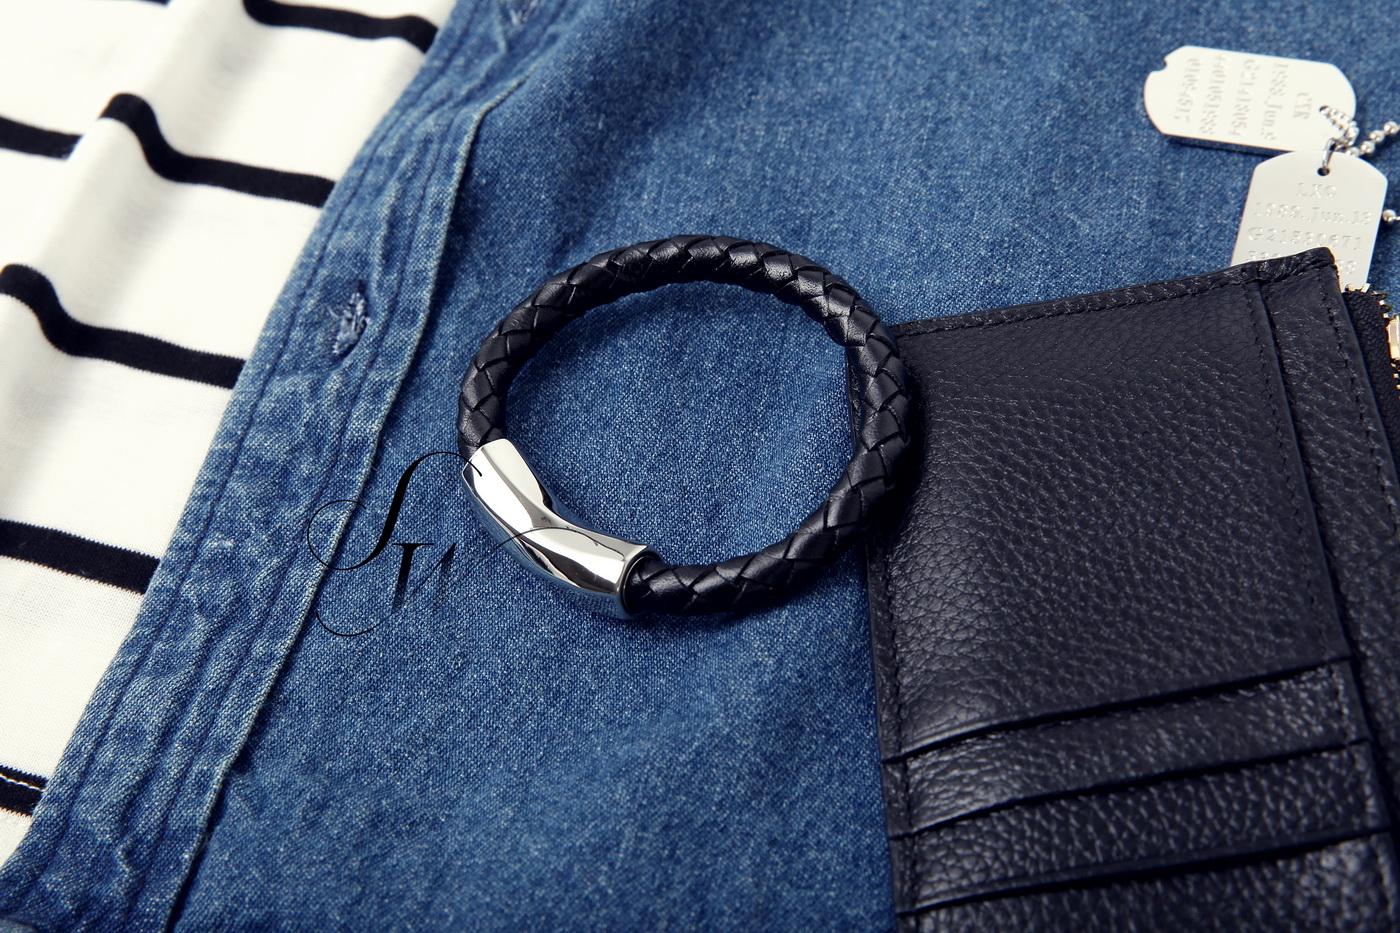 SW正韓韓國製時尚精品~扣壓式磁石扣頭螺旋鈦鋼粗編織皮革手環黑BV感K81121